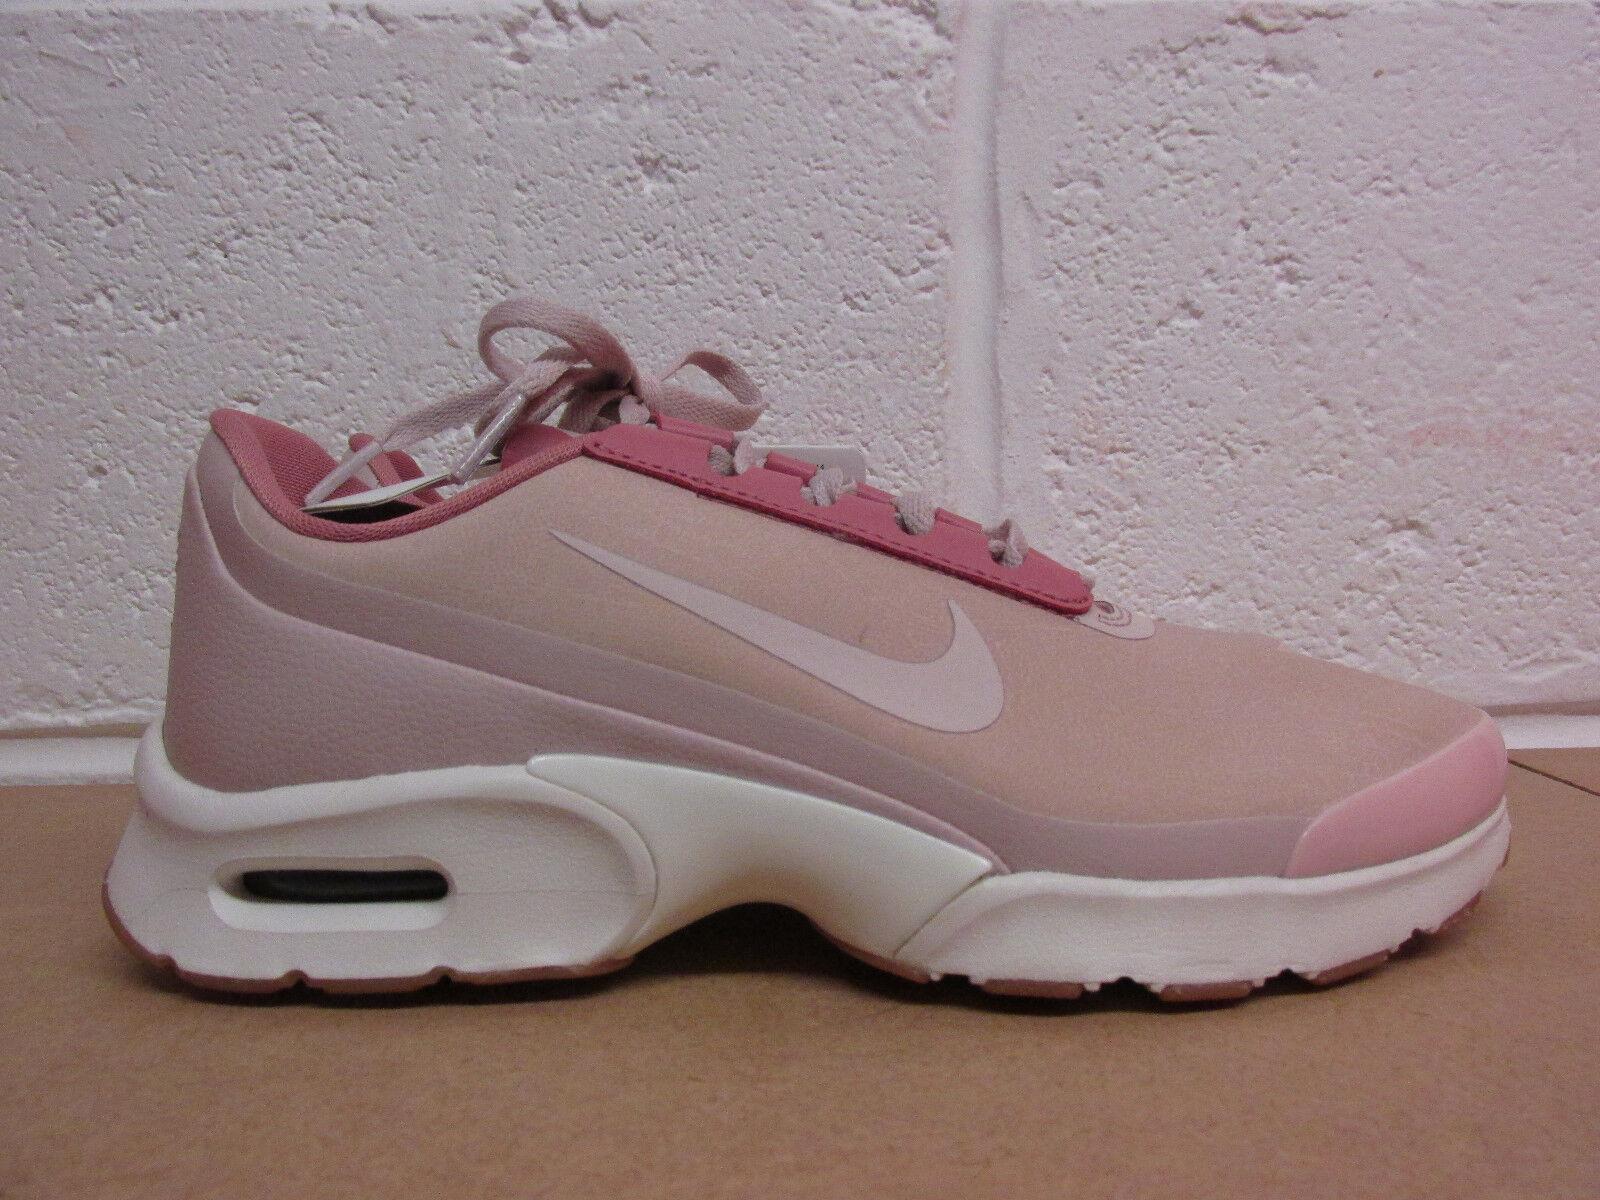 Nike air max jewell 896195 601 Donna trainers scarpe da ginnastica shoes SAMPLE